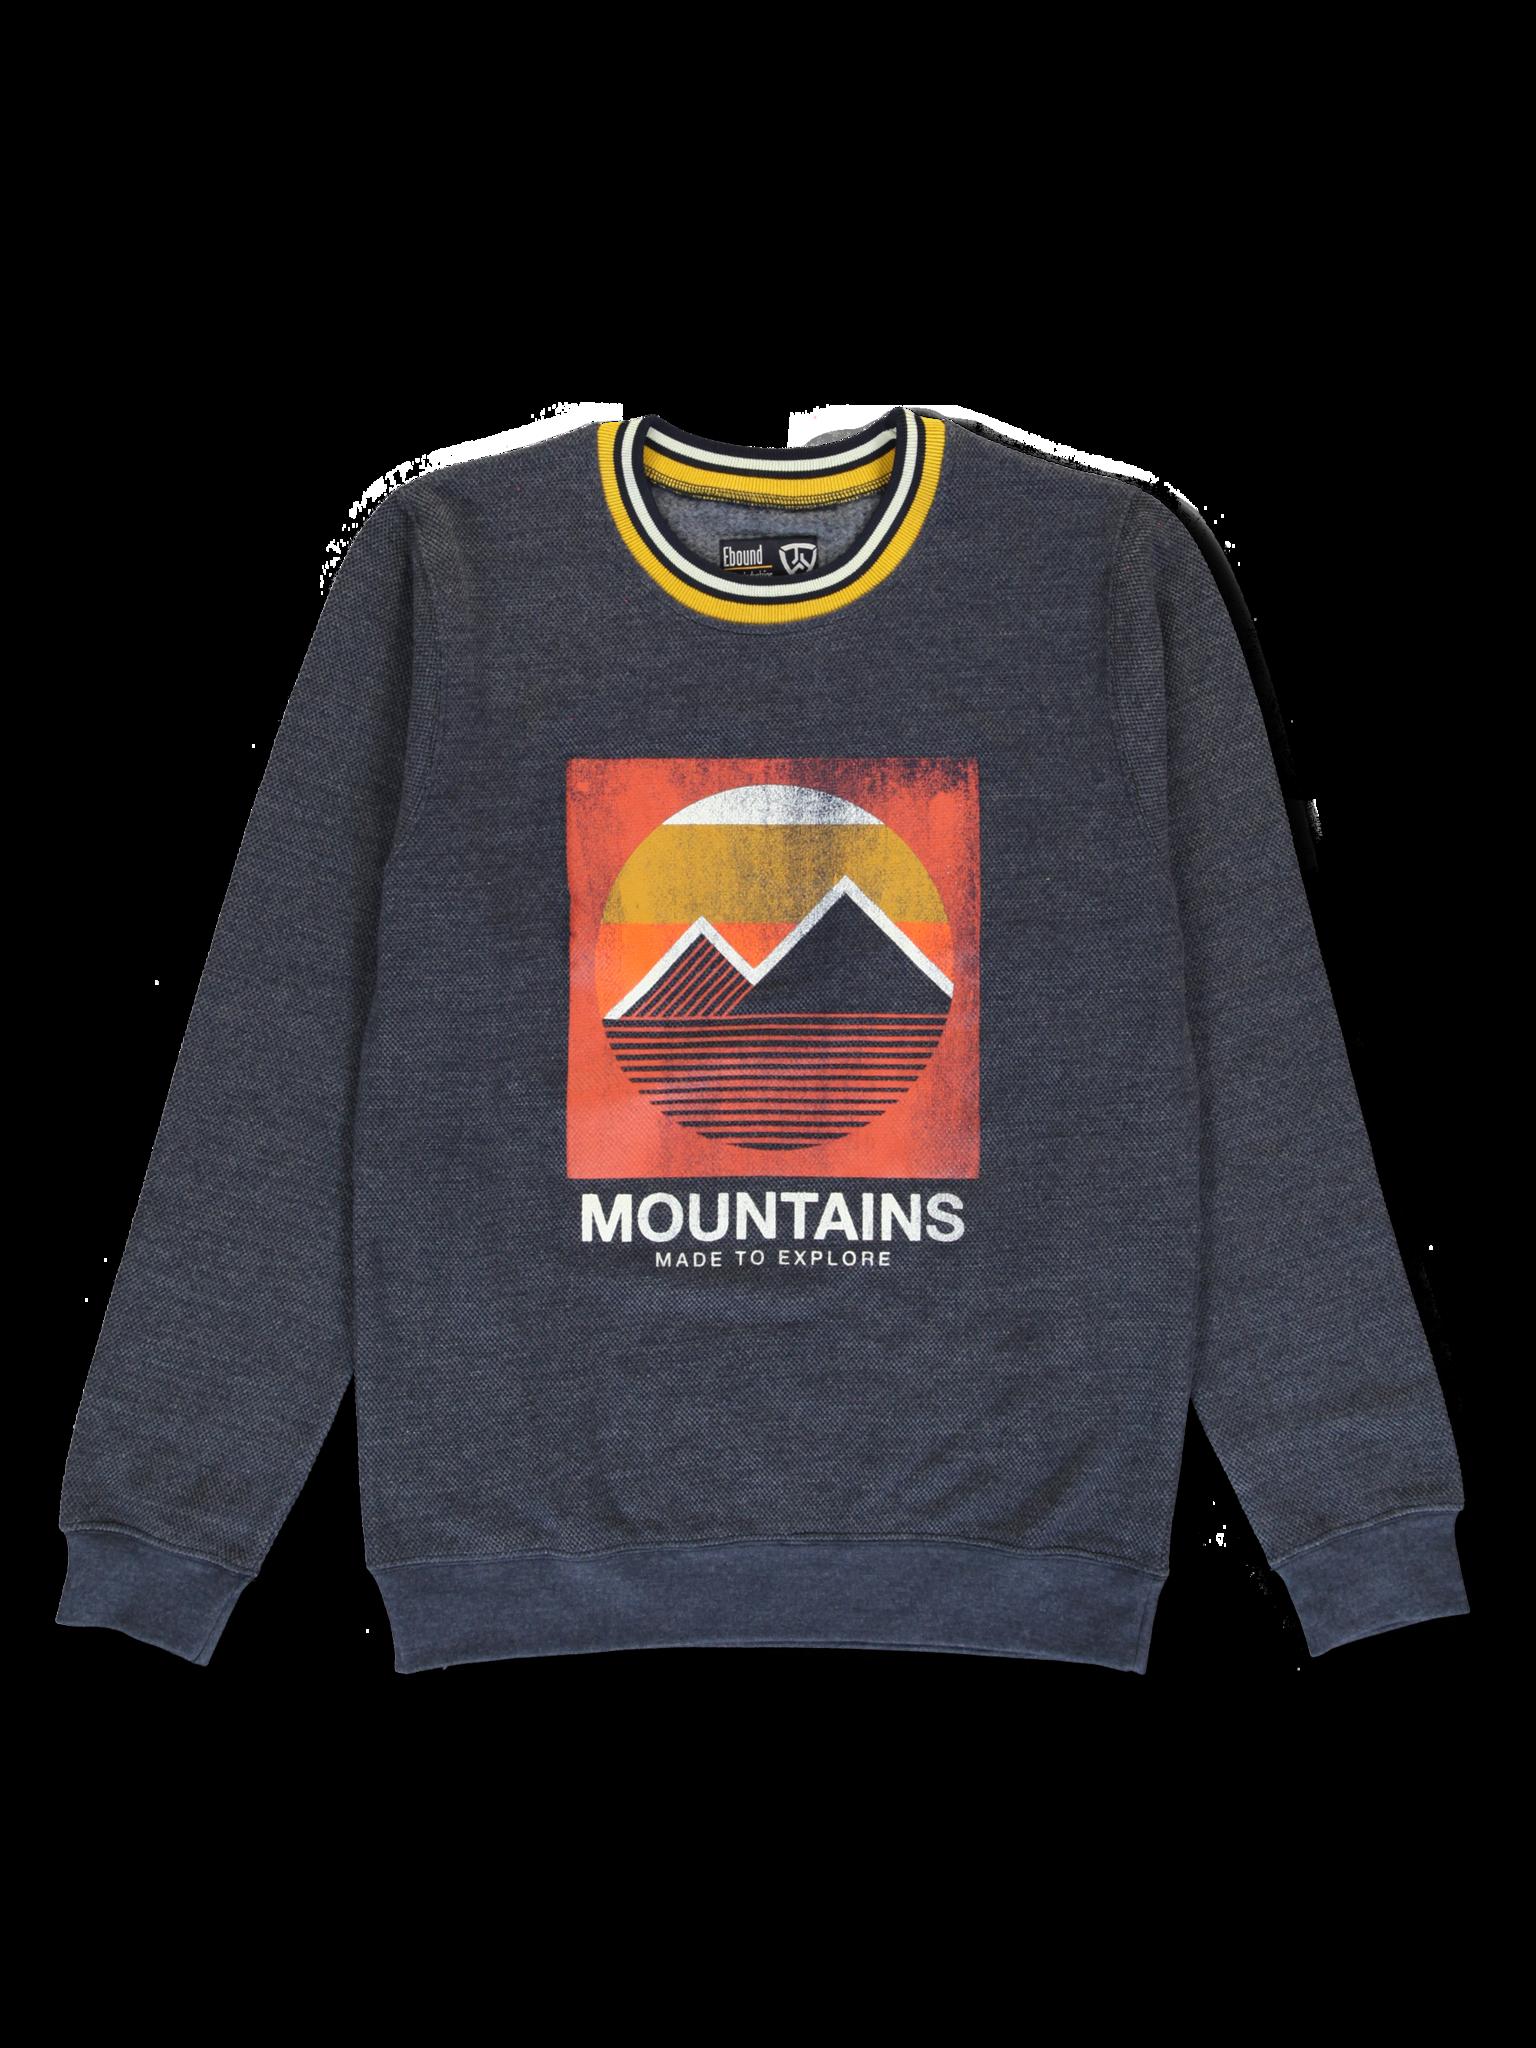 All Brands | Winterproducts Men | Sweatshirt | 18 pcs/box